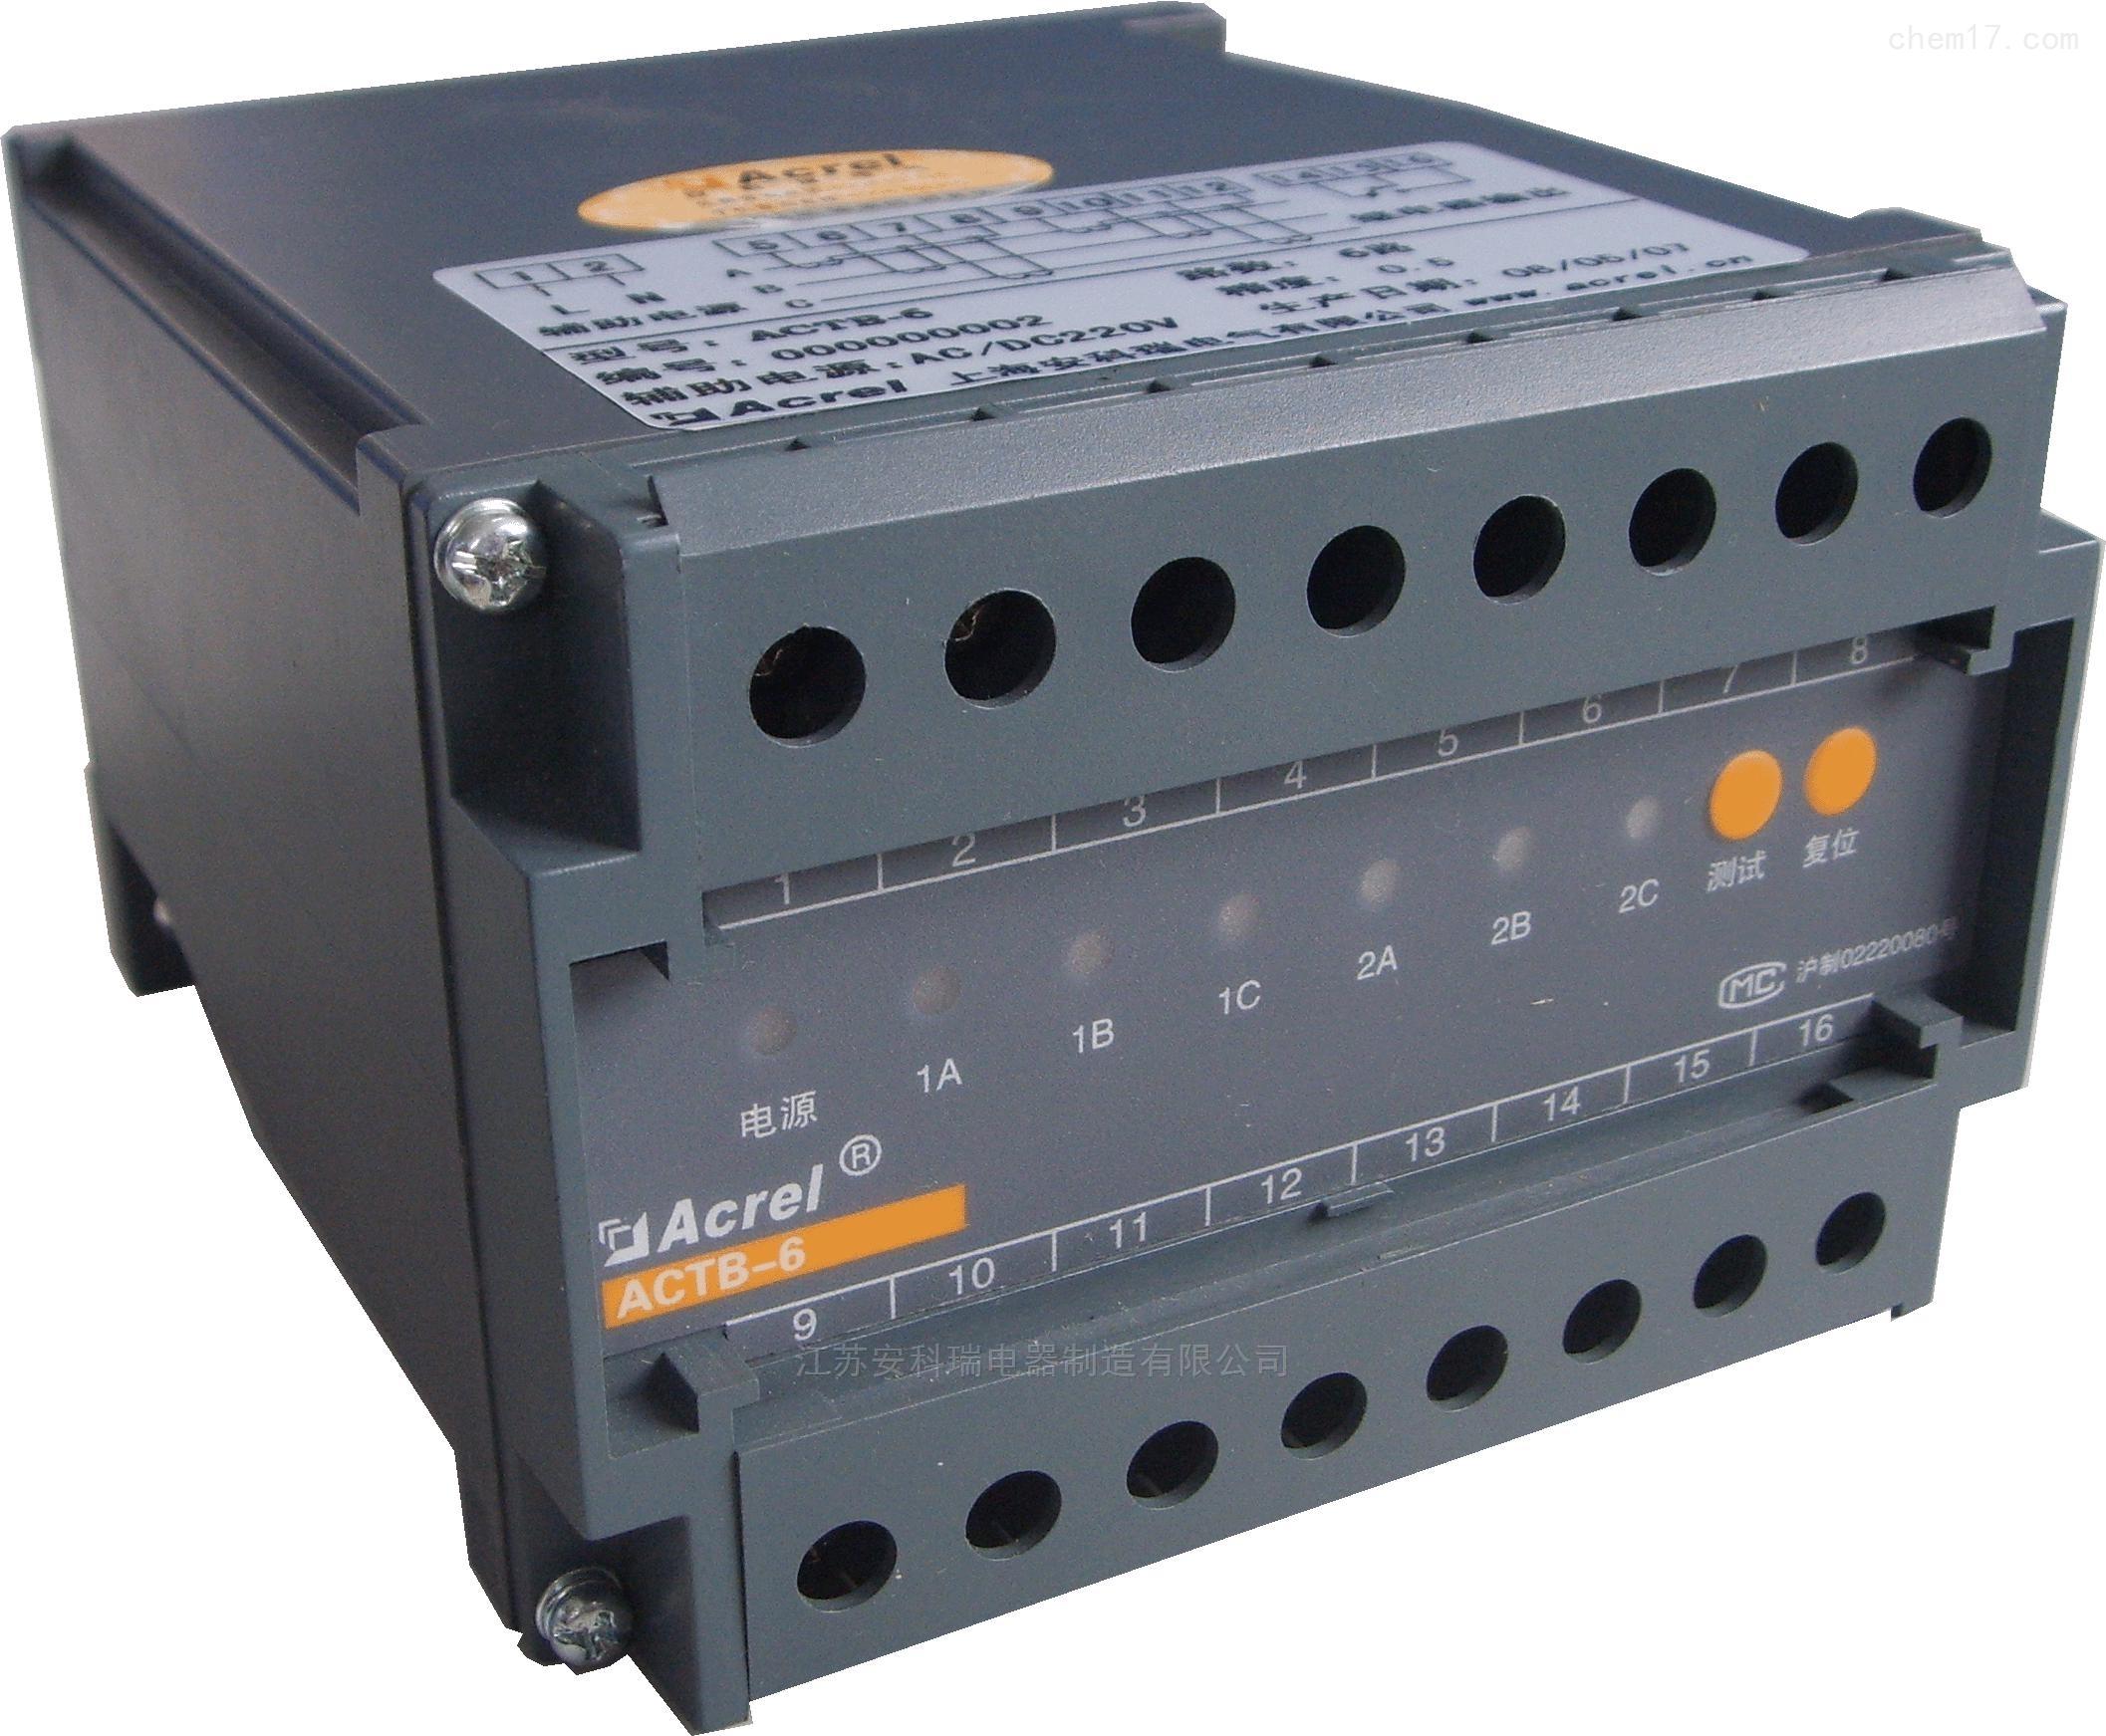 ABB精科互感器有限公司成立